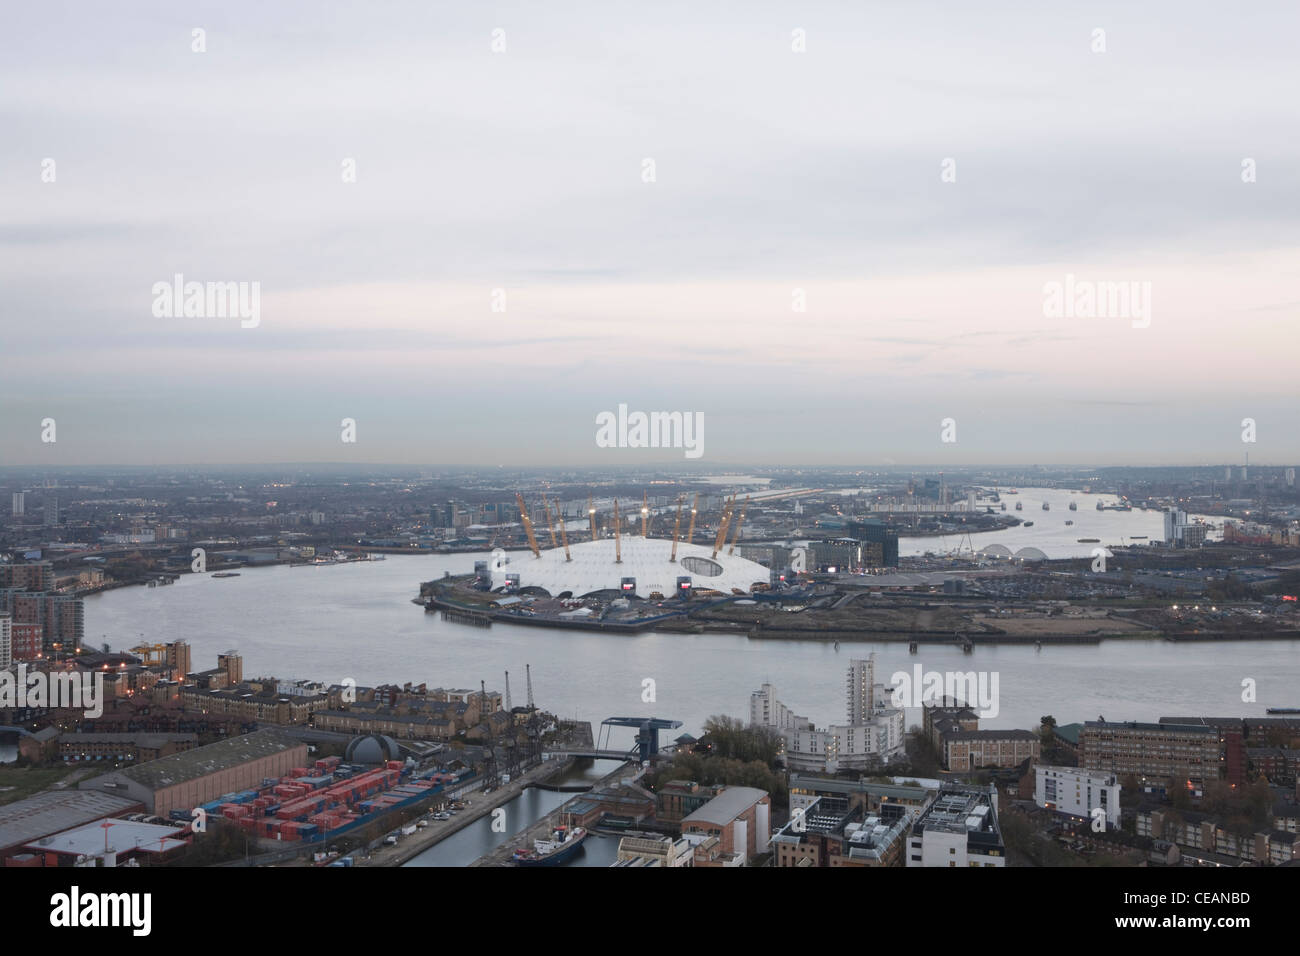 River Thames, The O2 Arena East, London, England - Stock Image